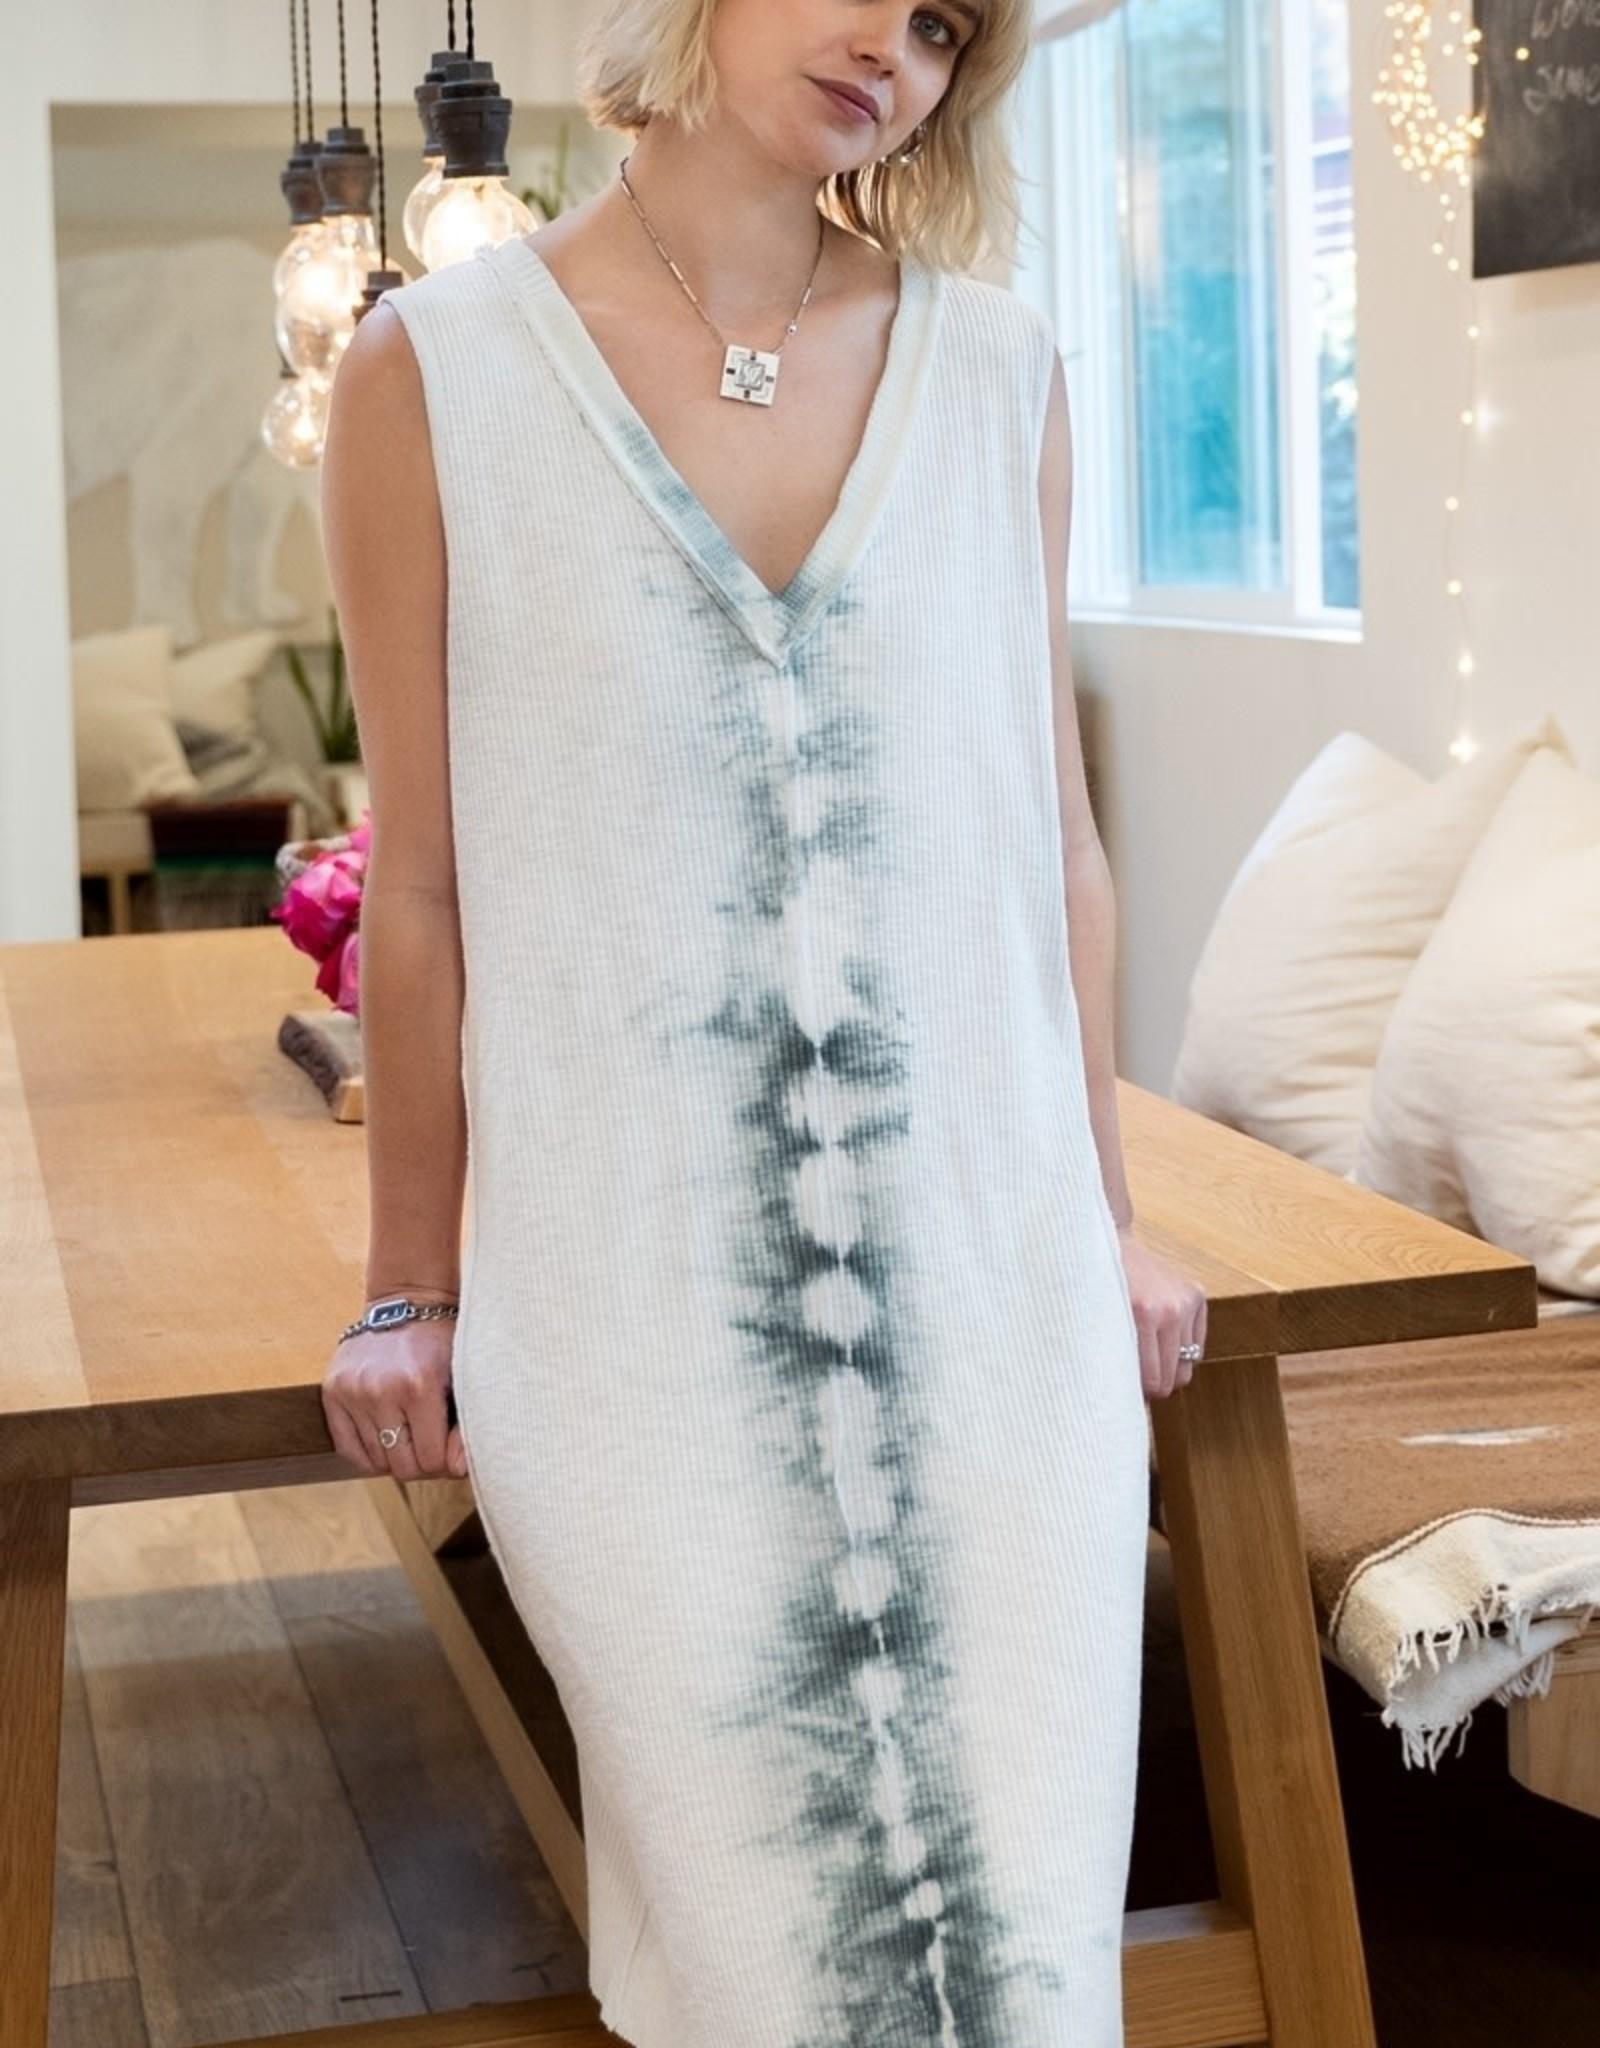 POL Clothing Tie Dye Knit Dress